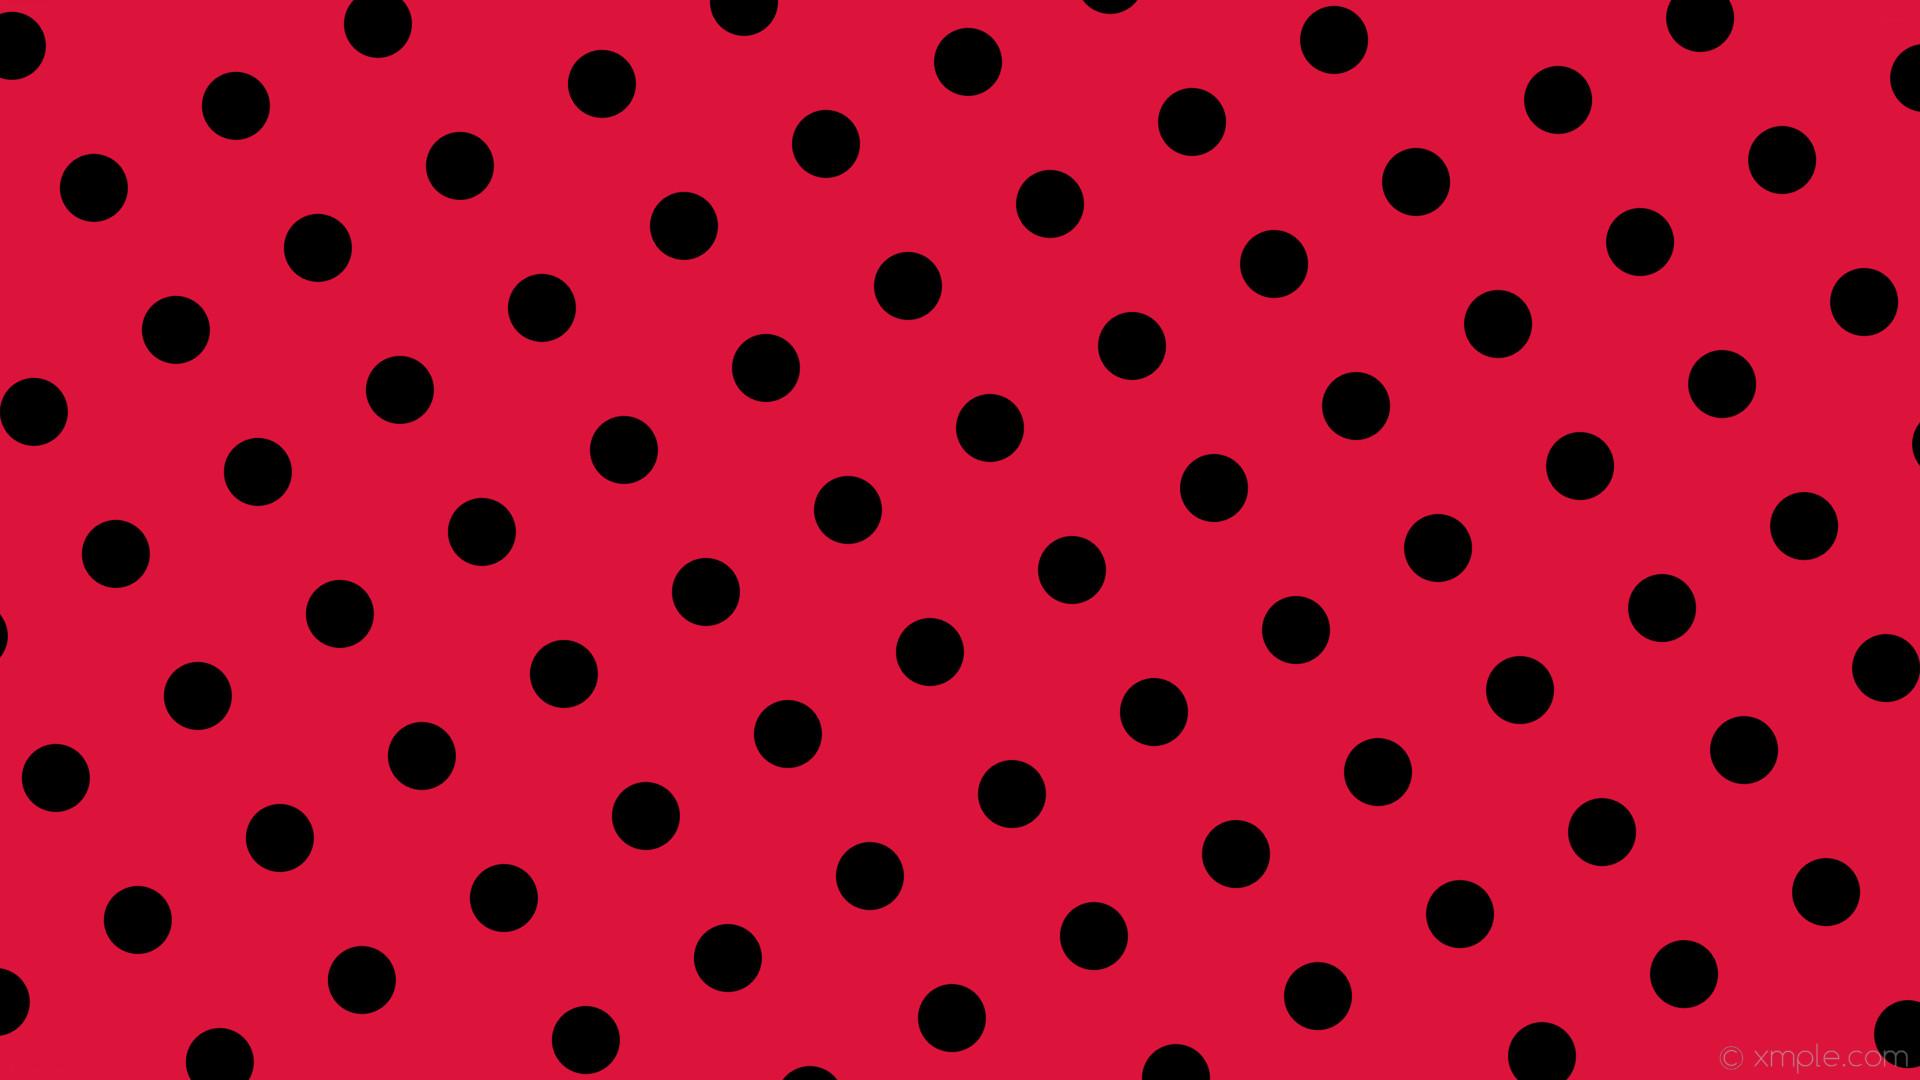 wallpaper red polka dots black spots crimson #dc143c #000000 30° 68px 164px